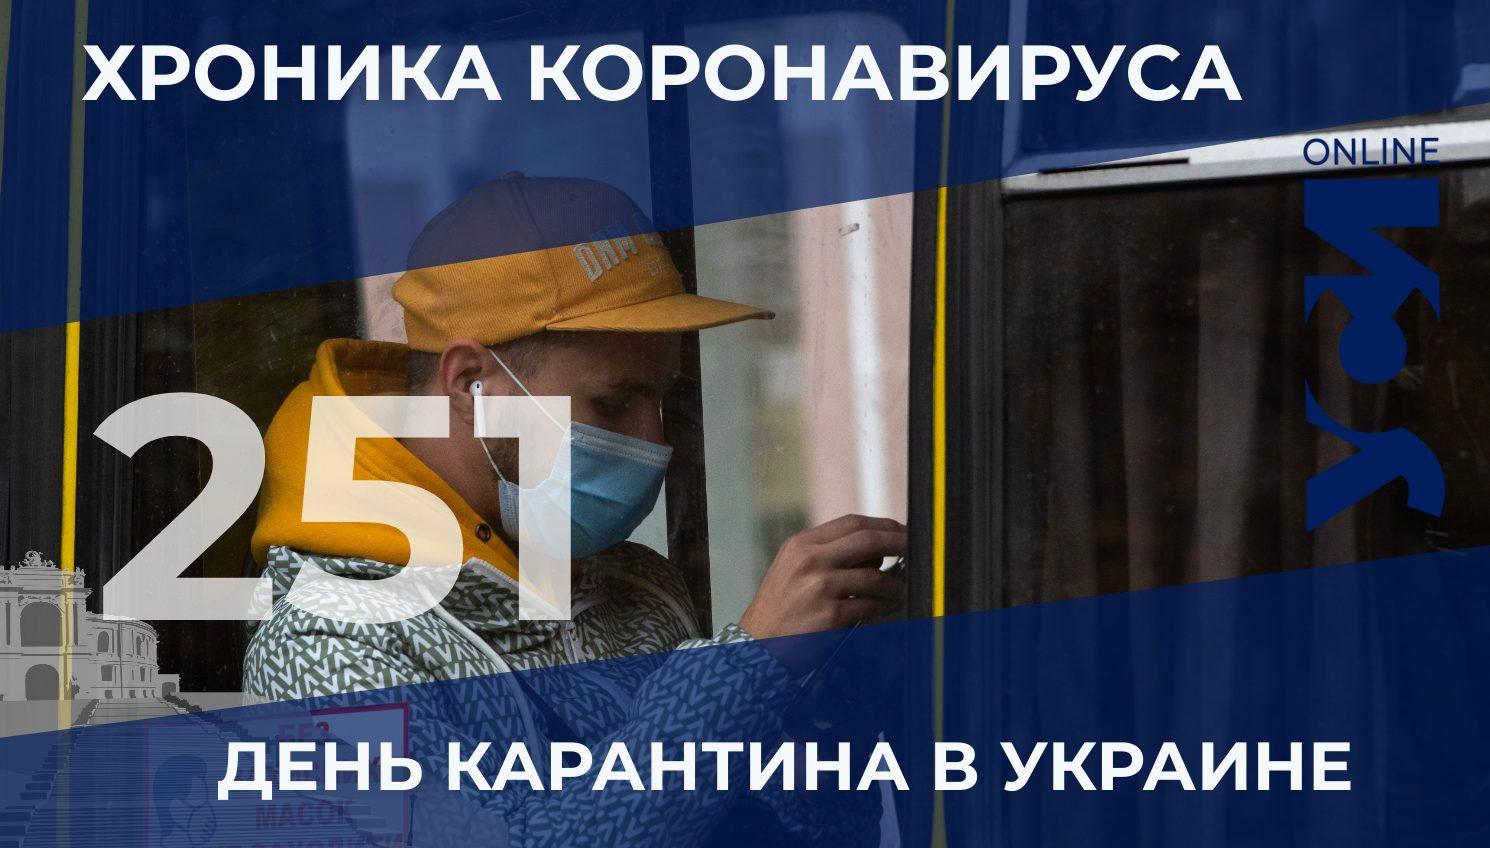 Хроника коронавируса: 251 день карантина в Украине «фото»